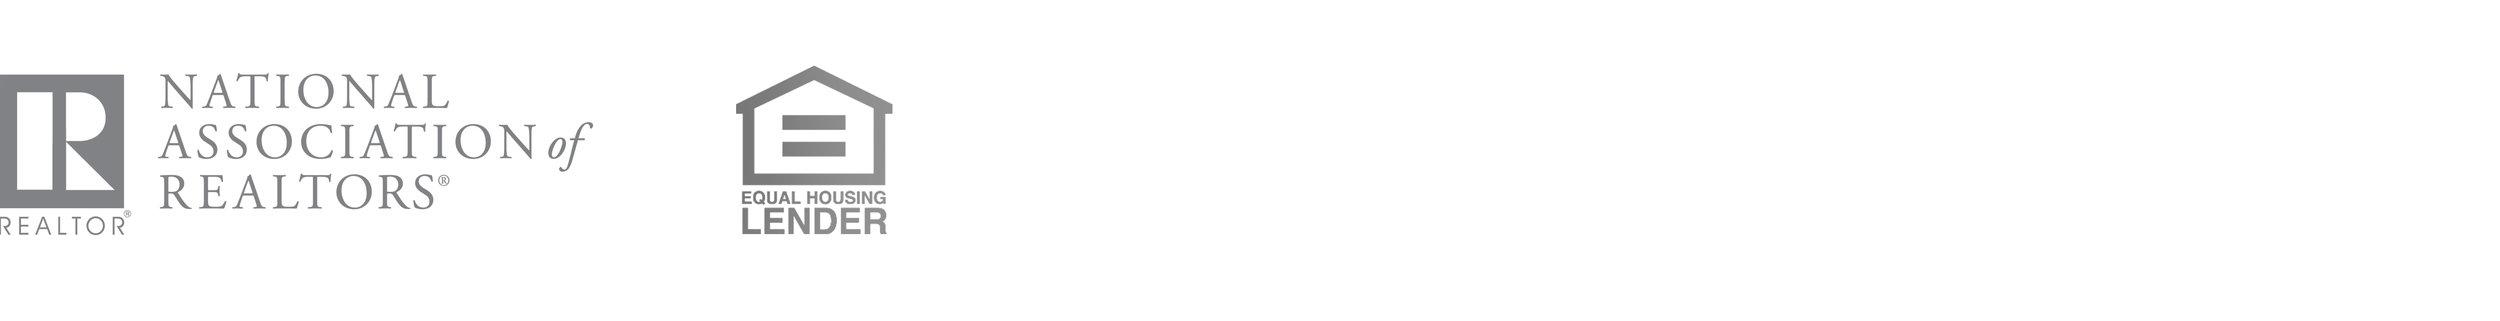 NAR_grey_logo-01.jpg